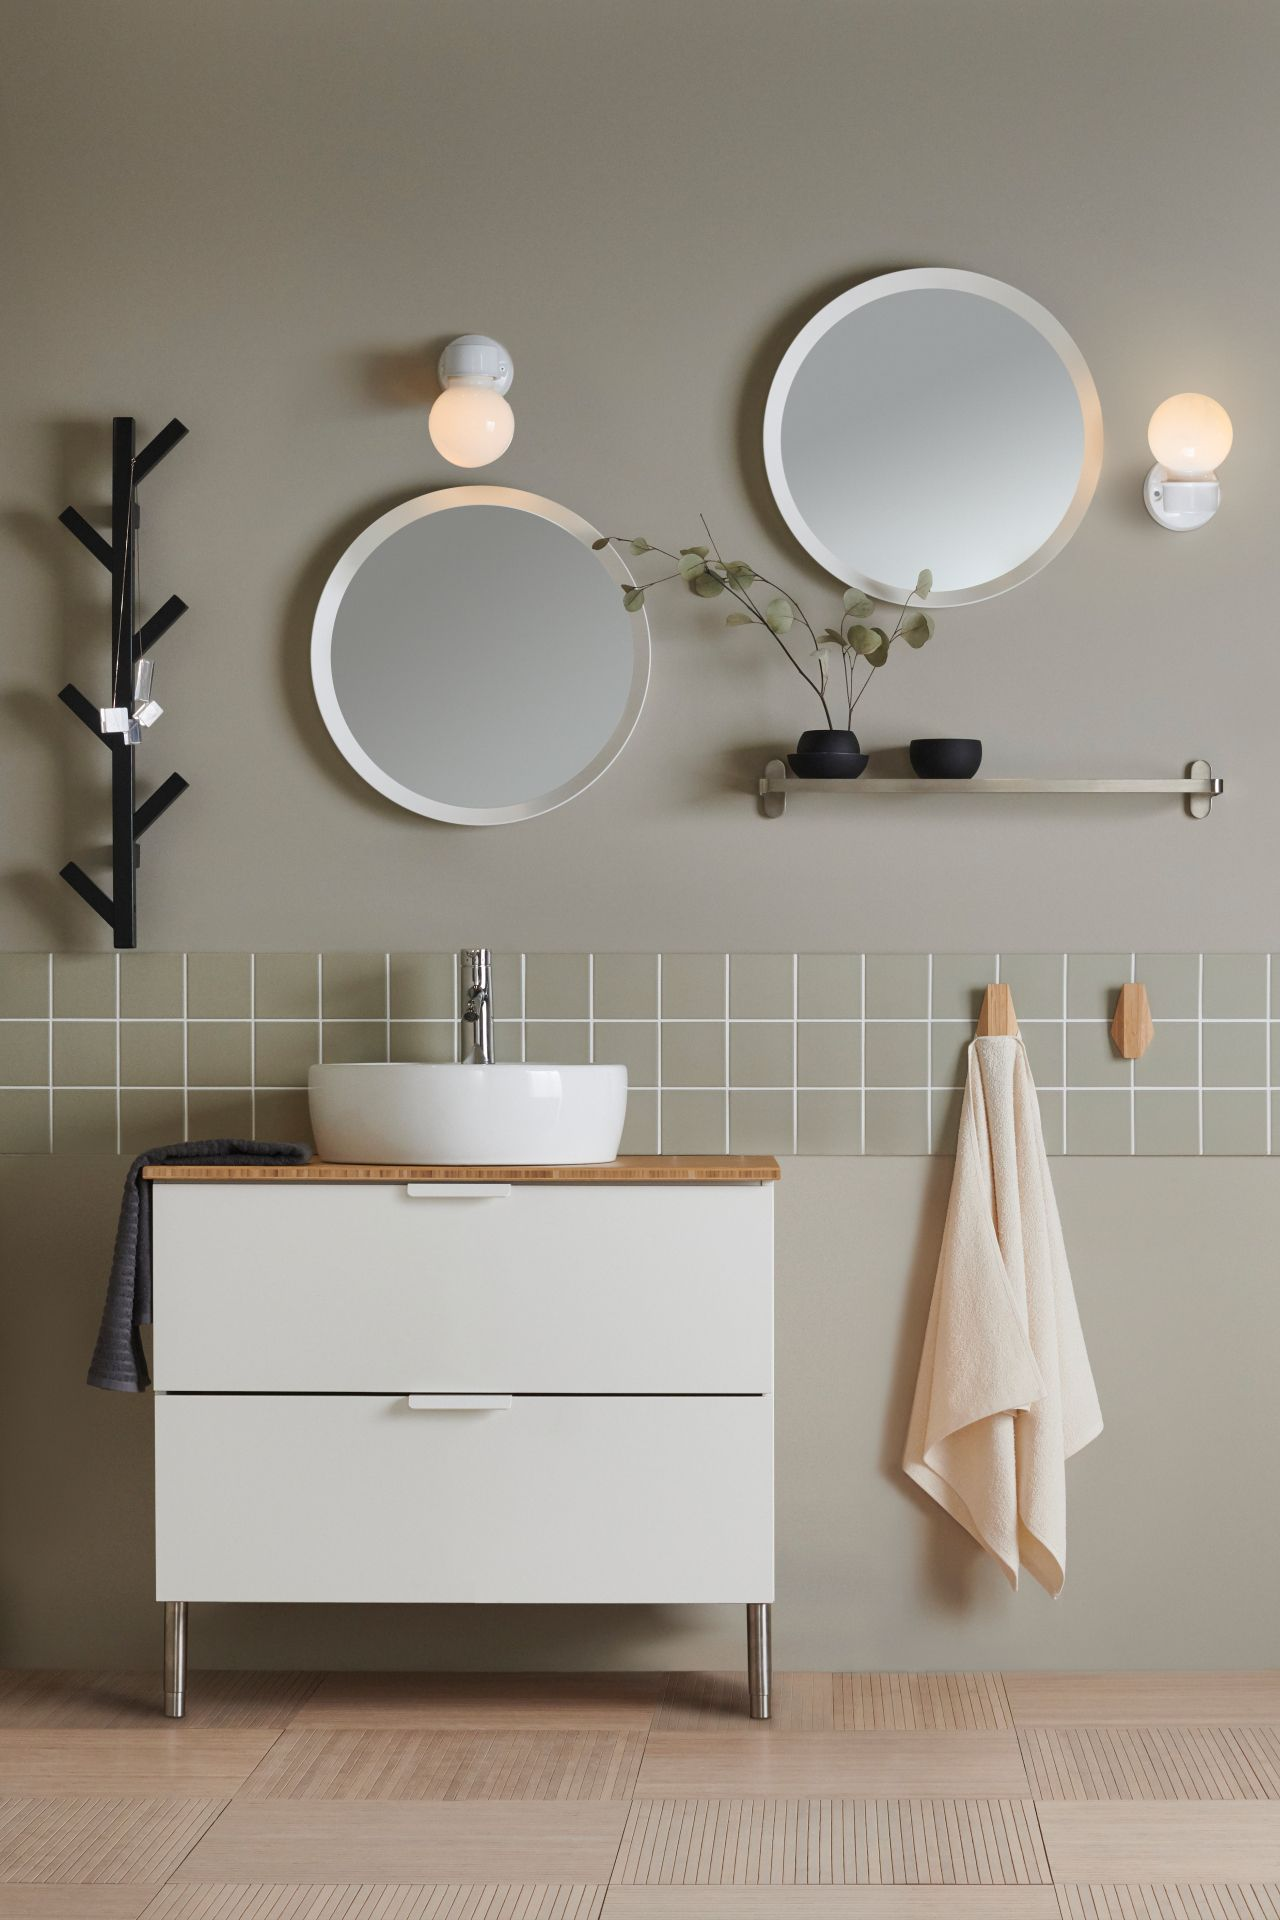 Amazing Asap Salle De Bain Design Ideas Remodel Welcome To Blog In 2020 Bathroom Interior Bathroom Interior Design Minimal Bathroom